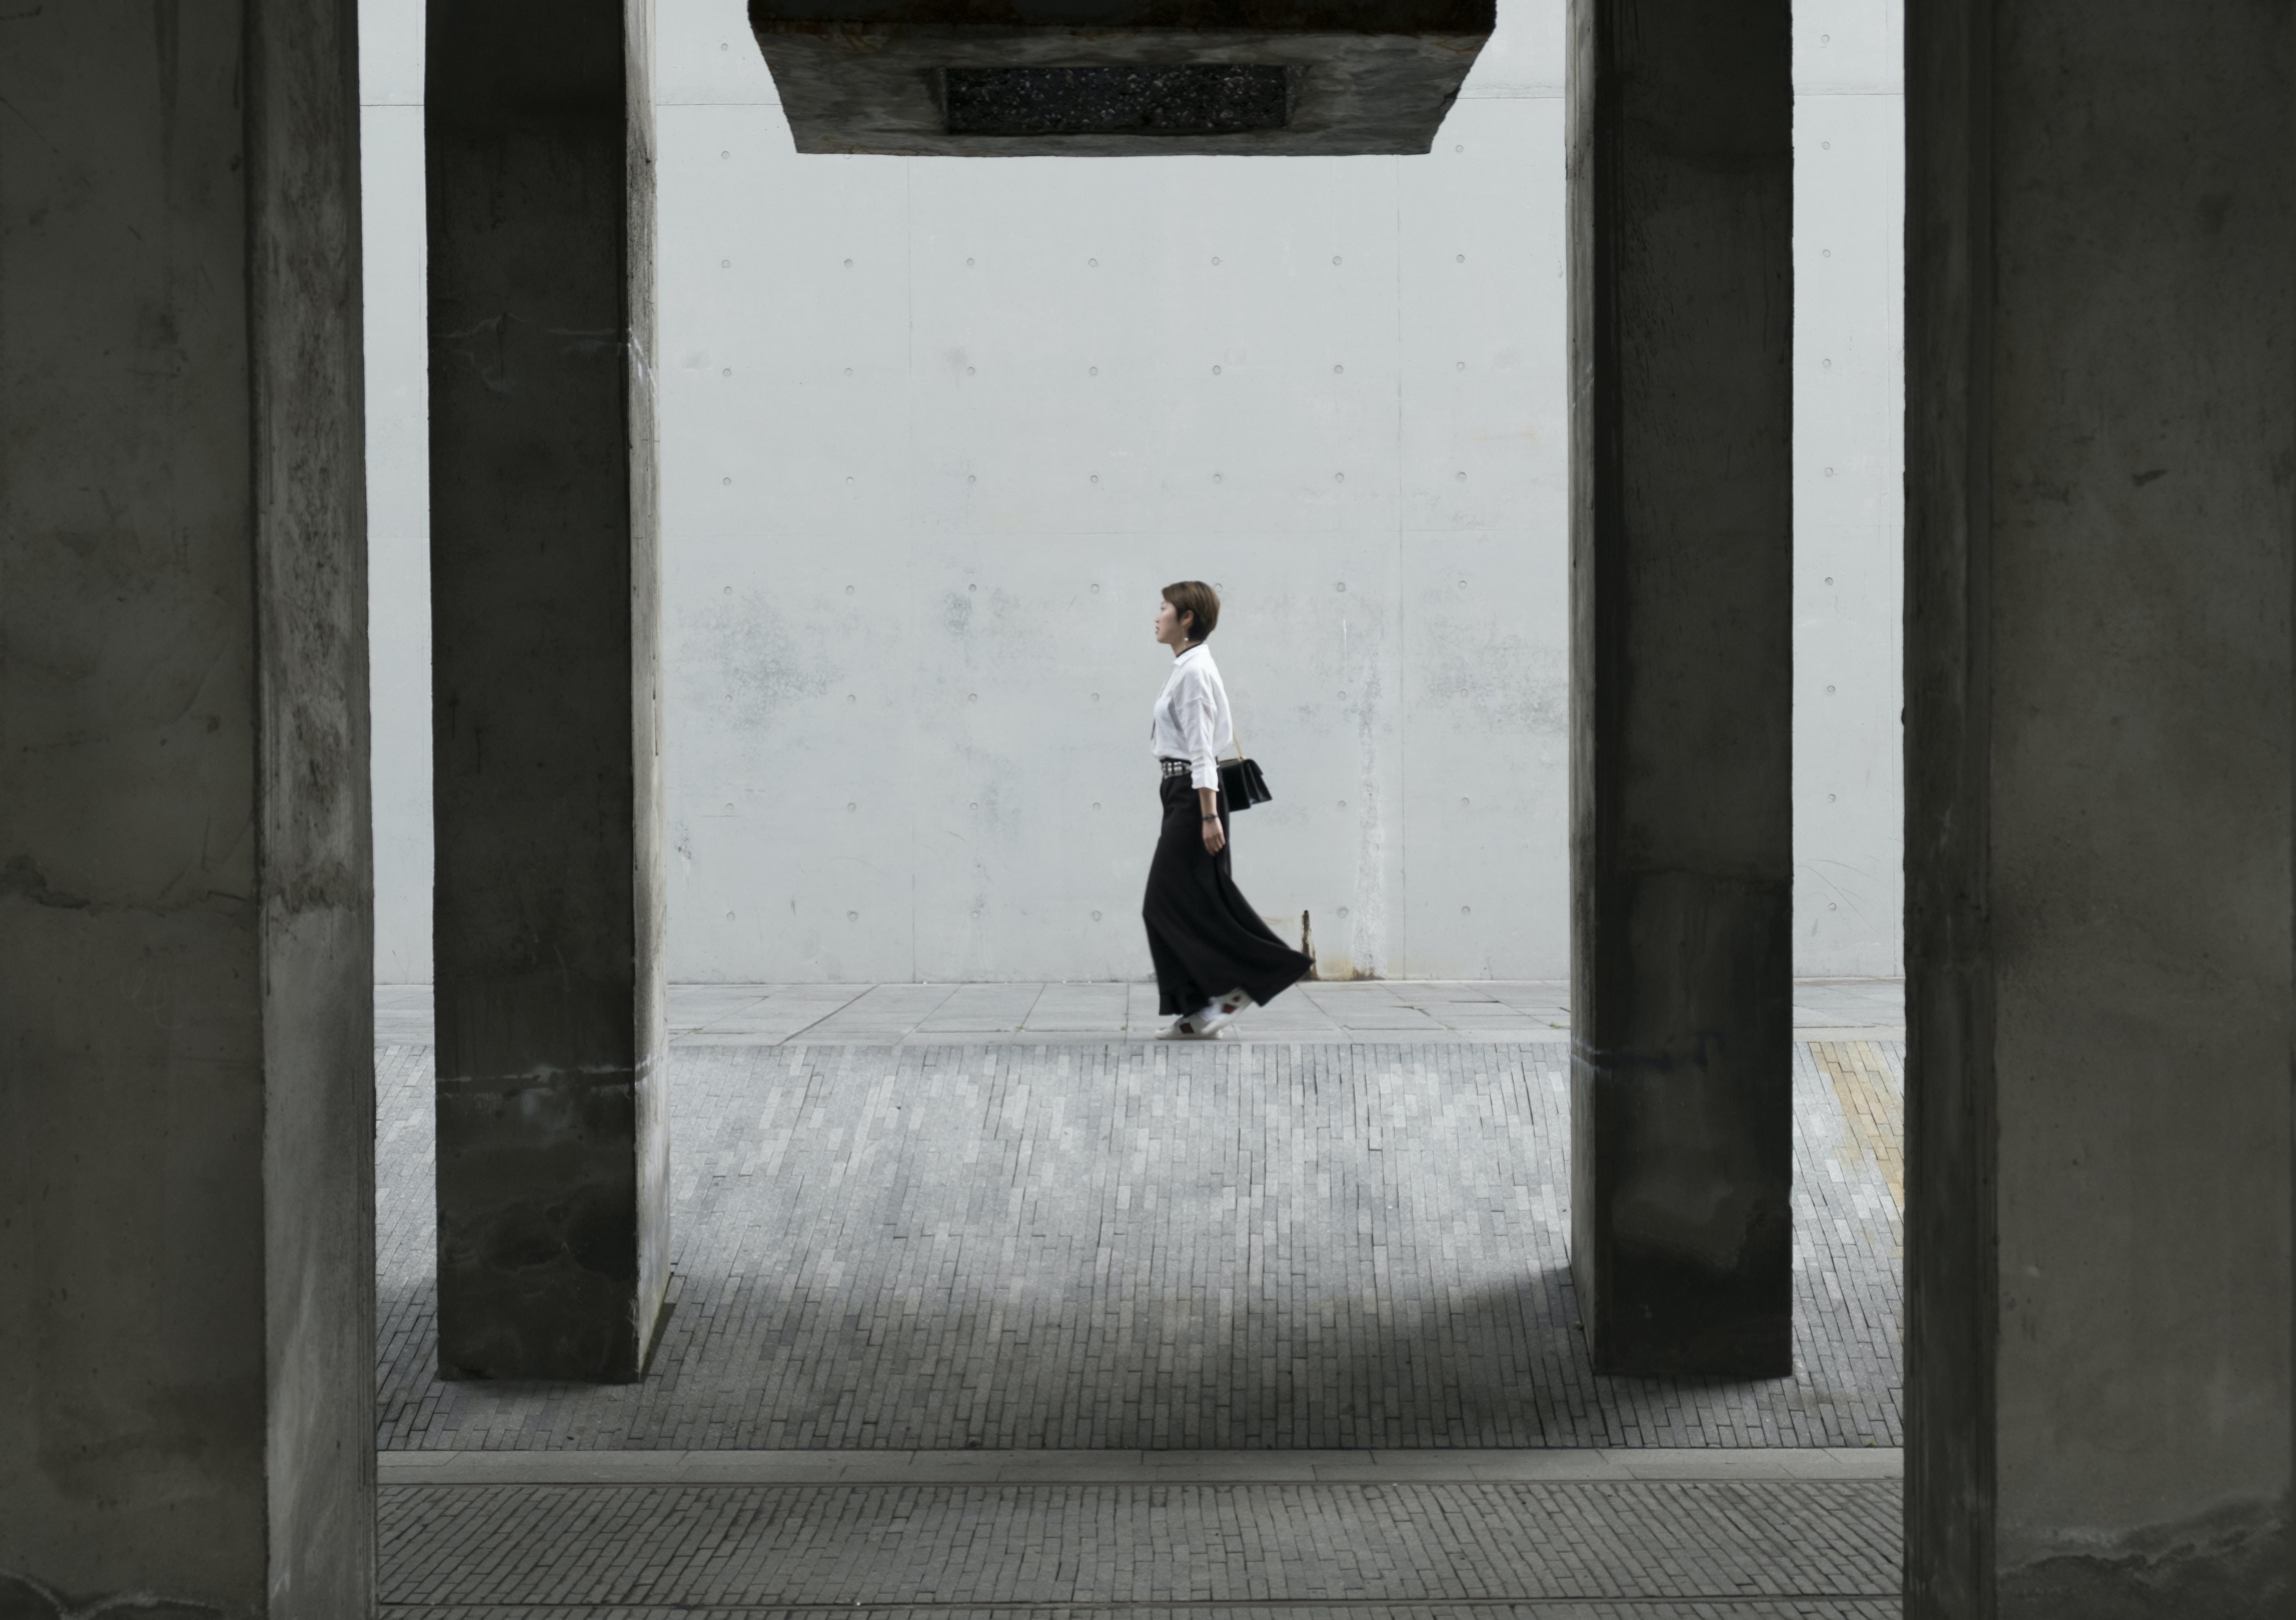 A woman in a black skirt walking on a sidewalk near a wall